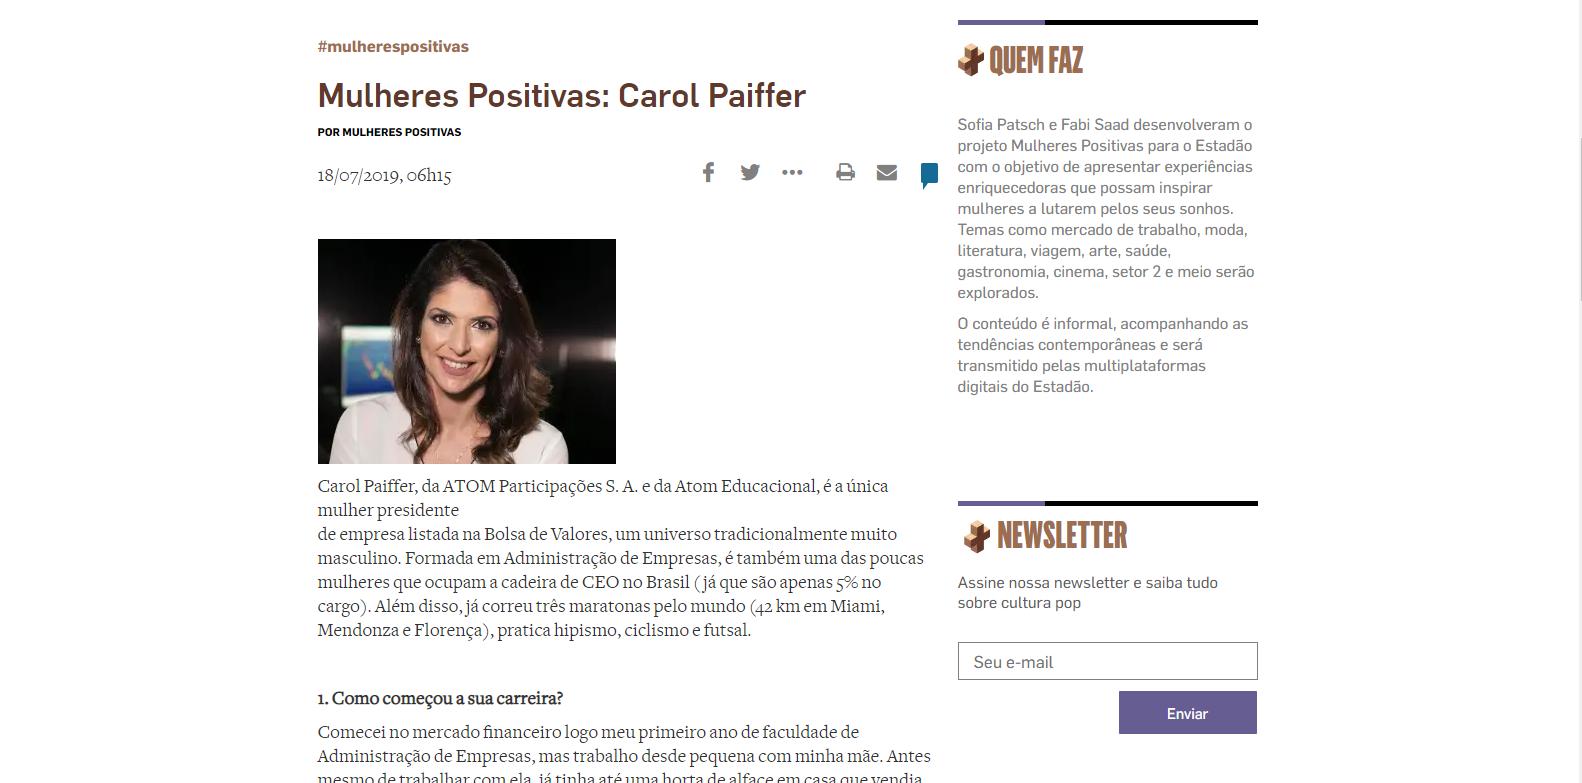 Mulheres Positivas: Carol Paiffer